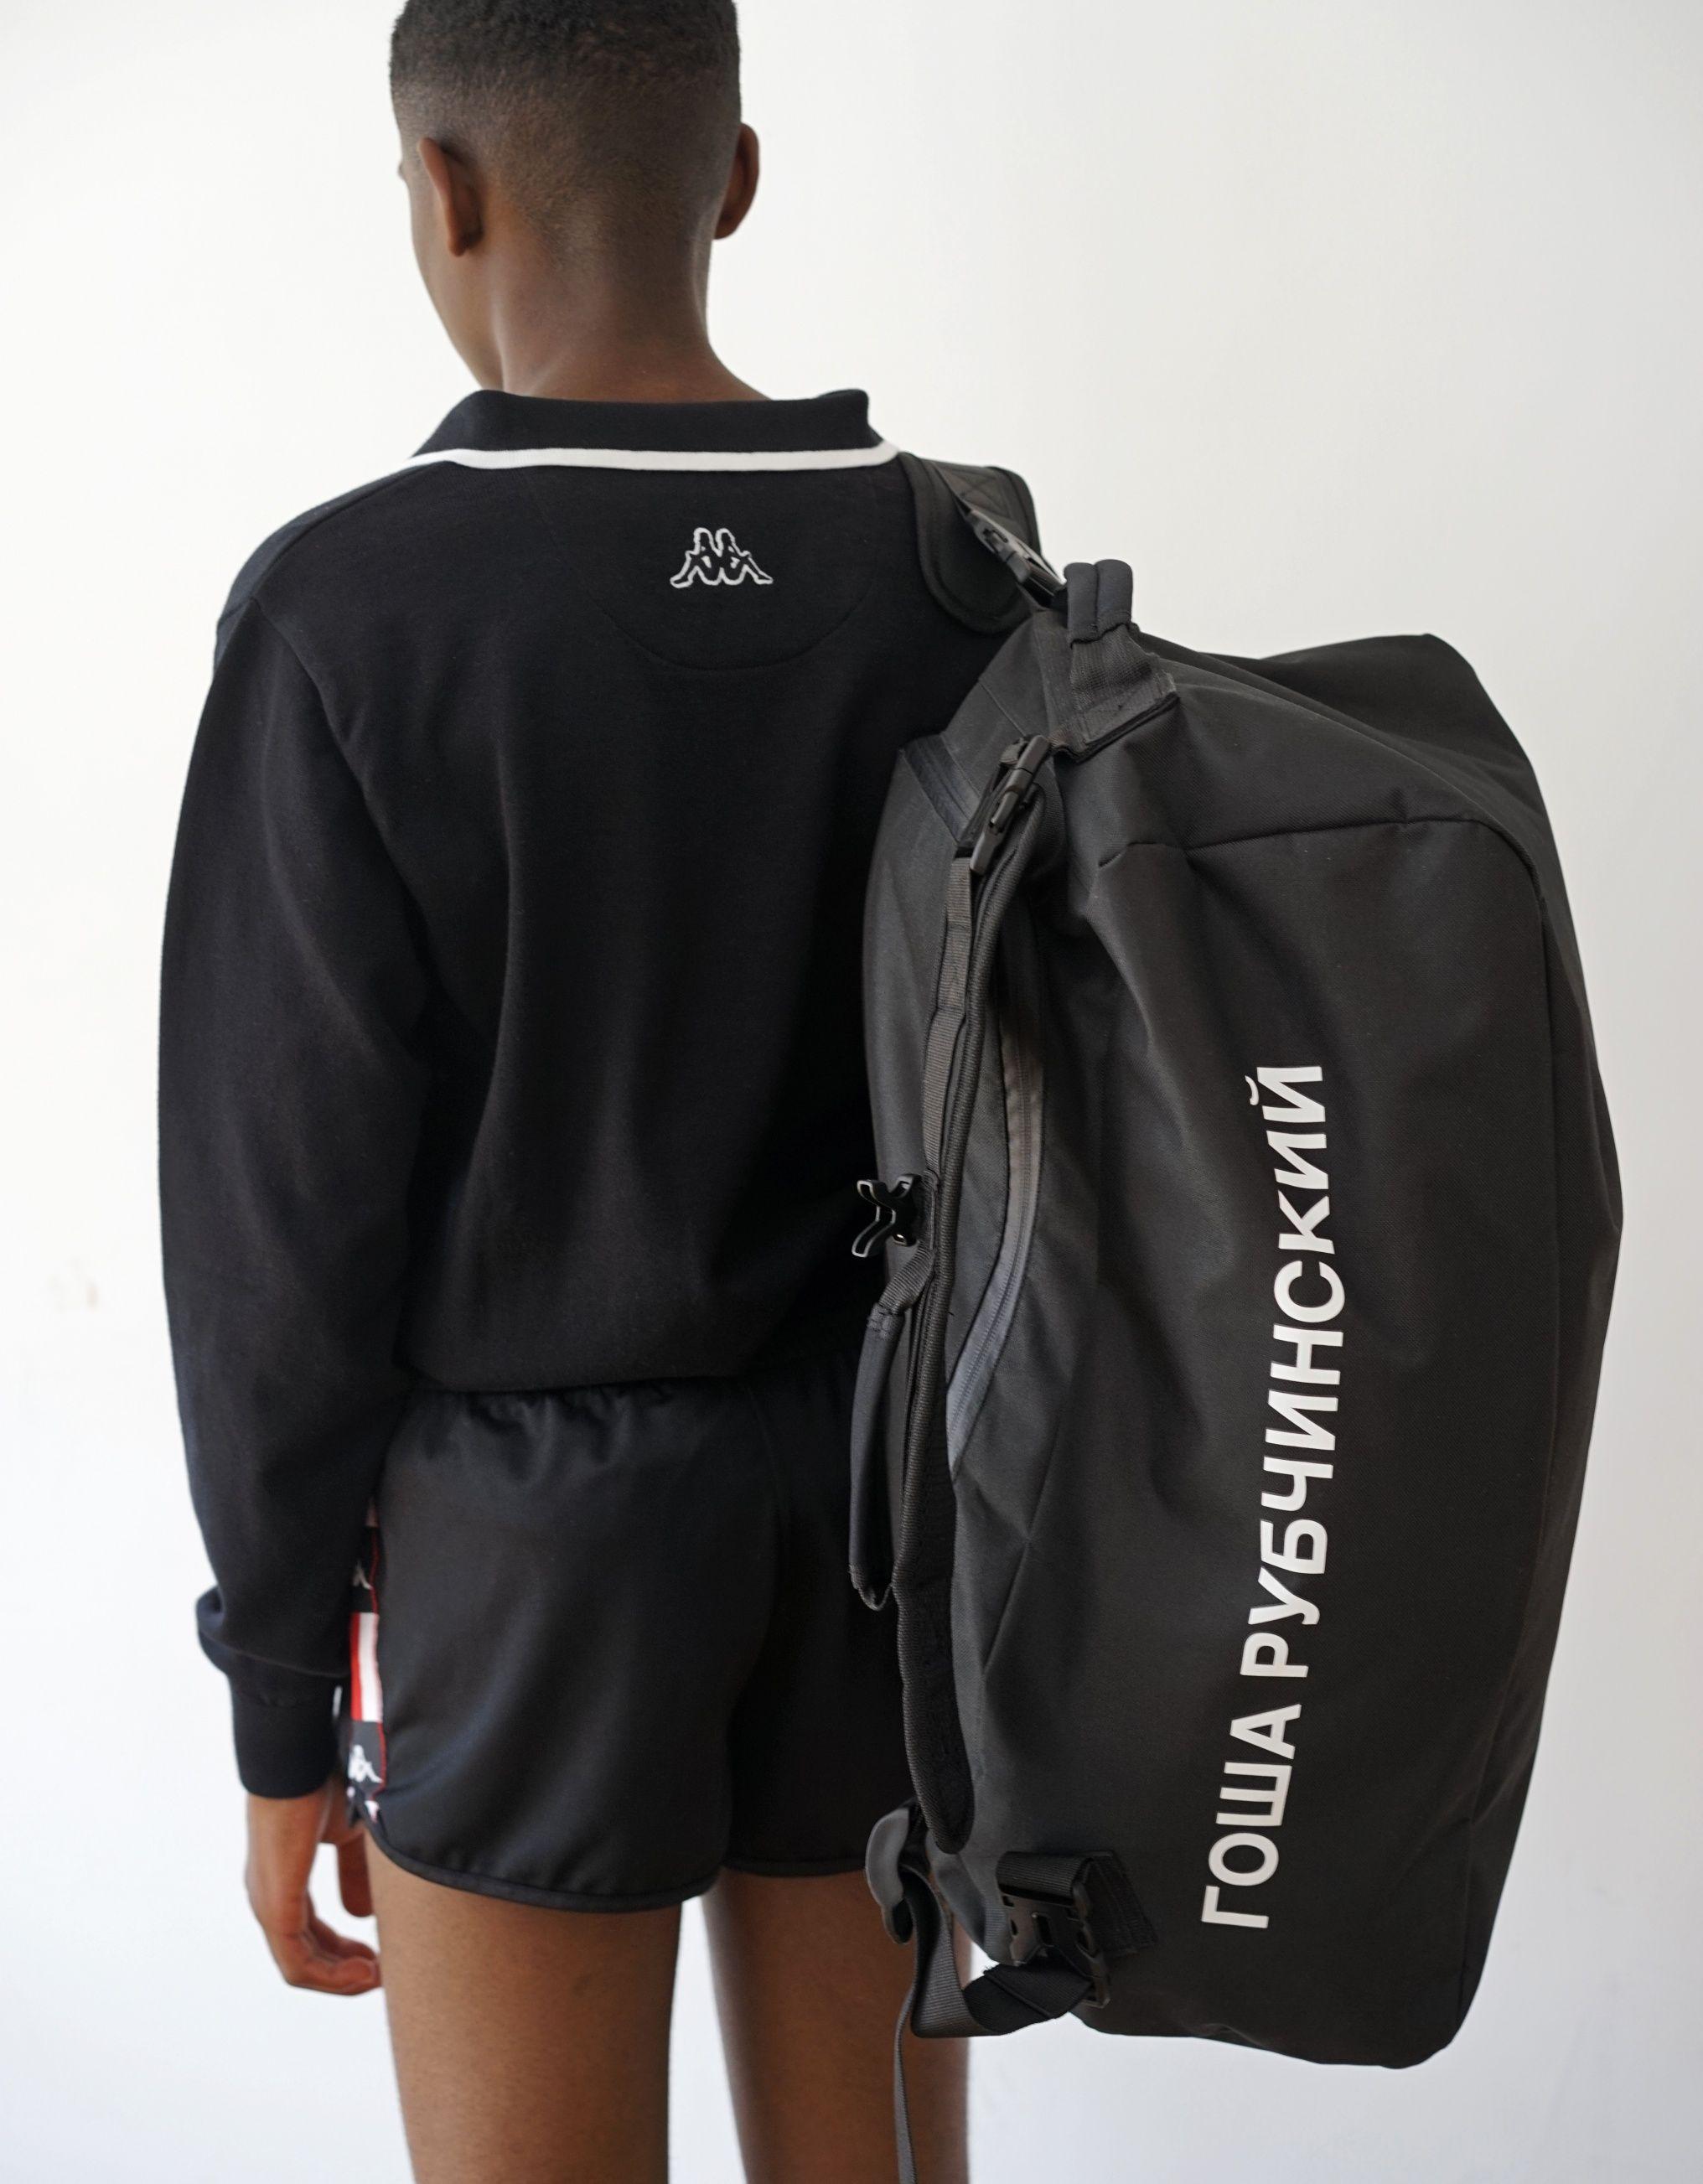 eaca73a53ef4 Kappa polyester backpack Gosha Rubchinskiy - buy